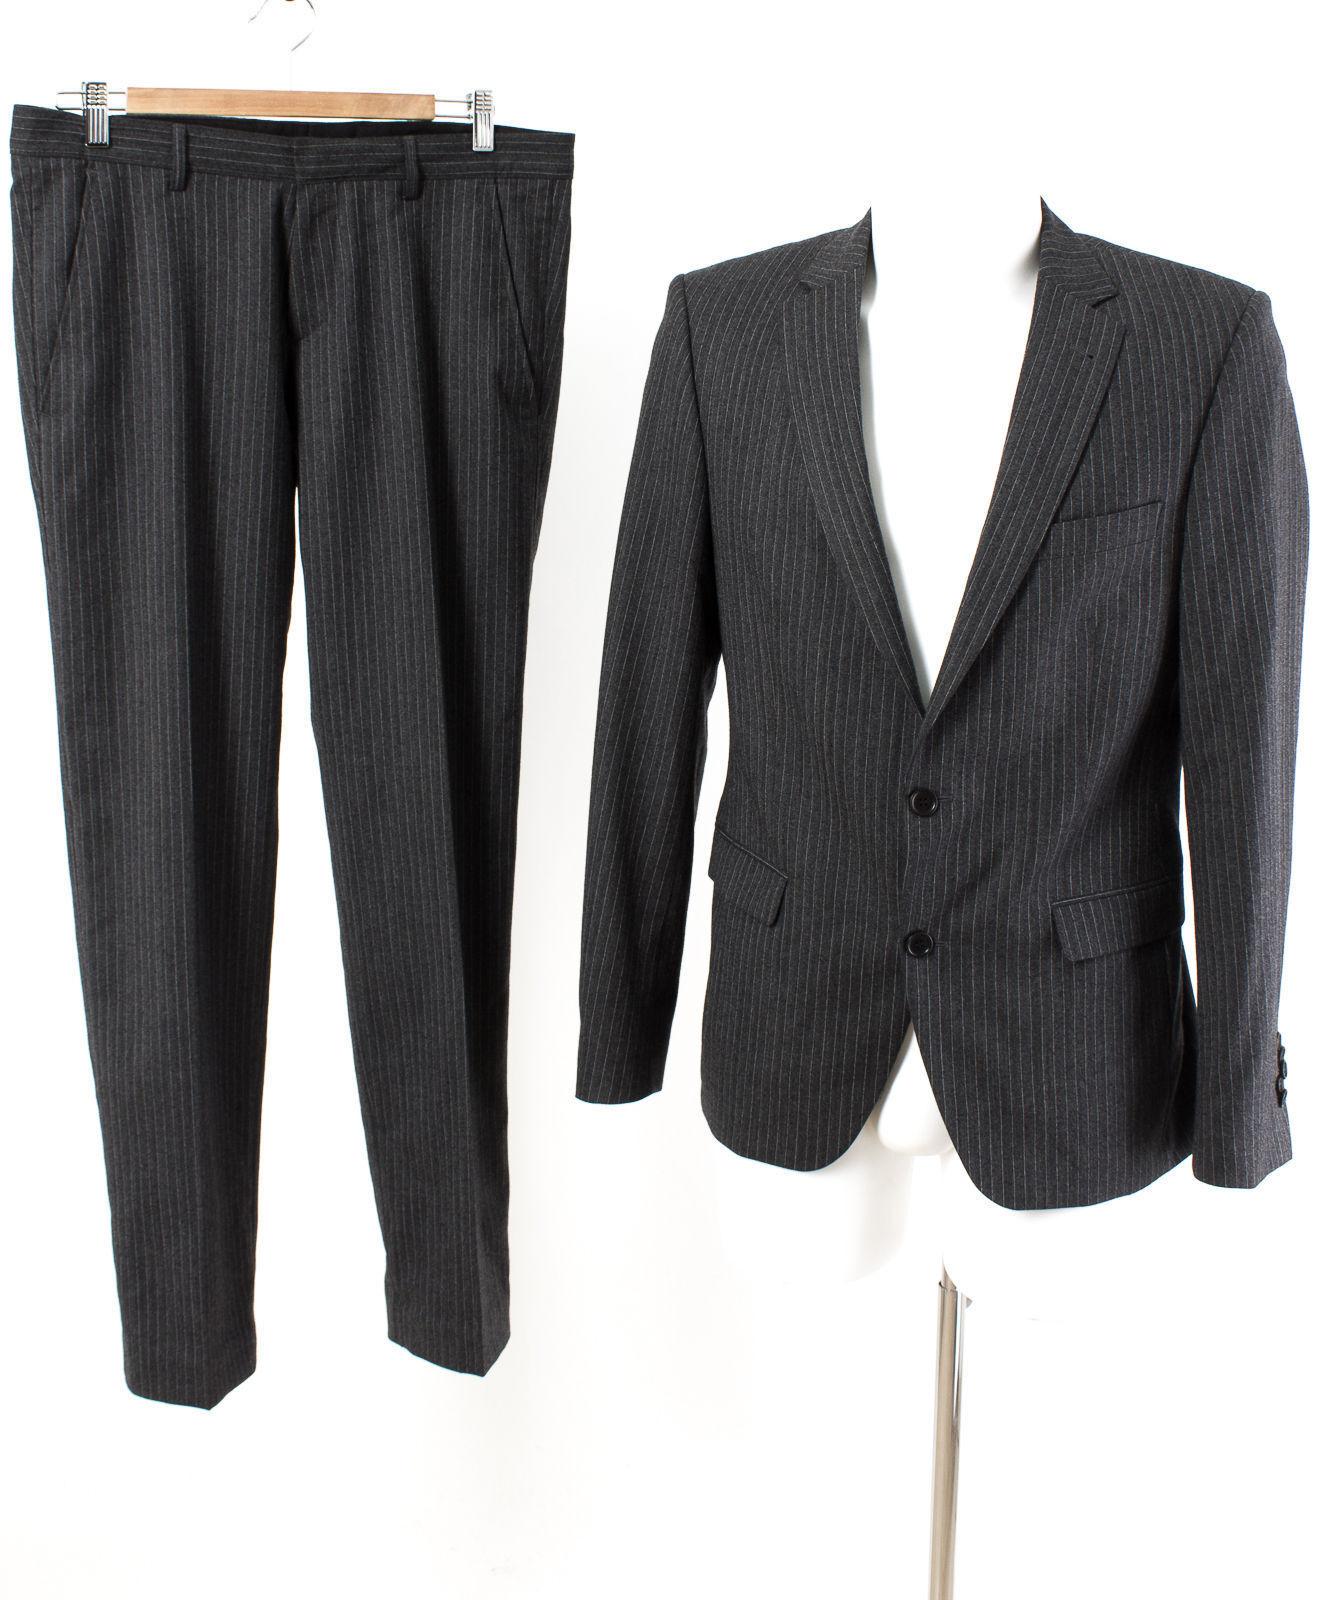 THEO WORMLAND Anzug Slim Fit Gr. S   48 SUPER 130'S Sakko Hose Business Suit